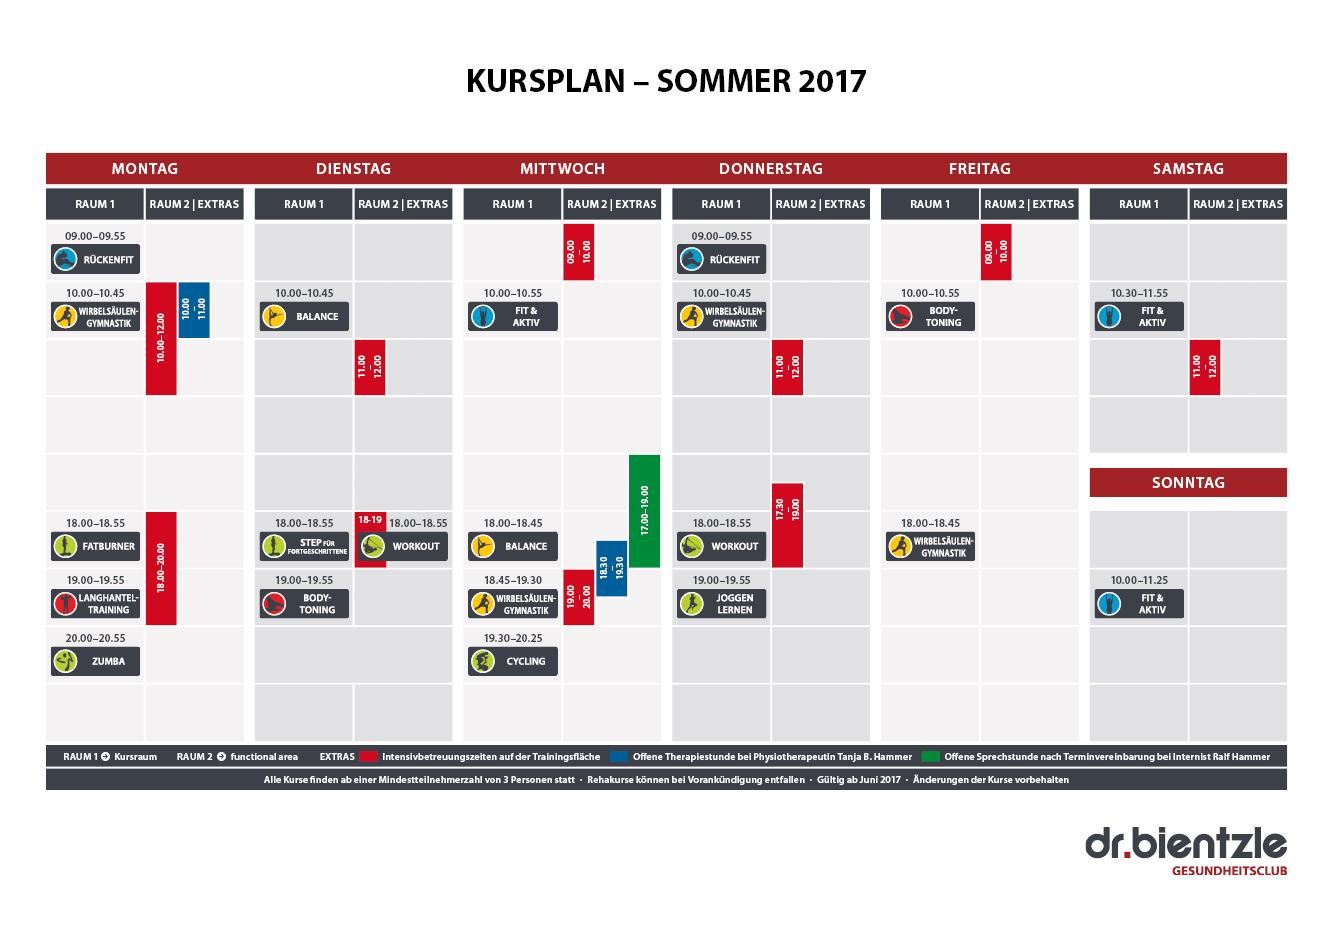 Unser Kursplan Sommer 2017